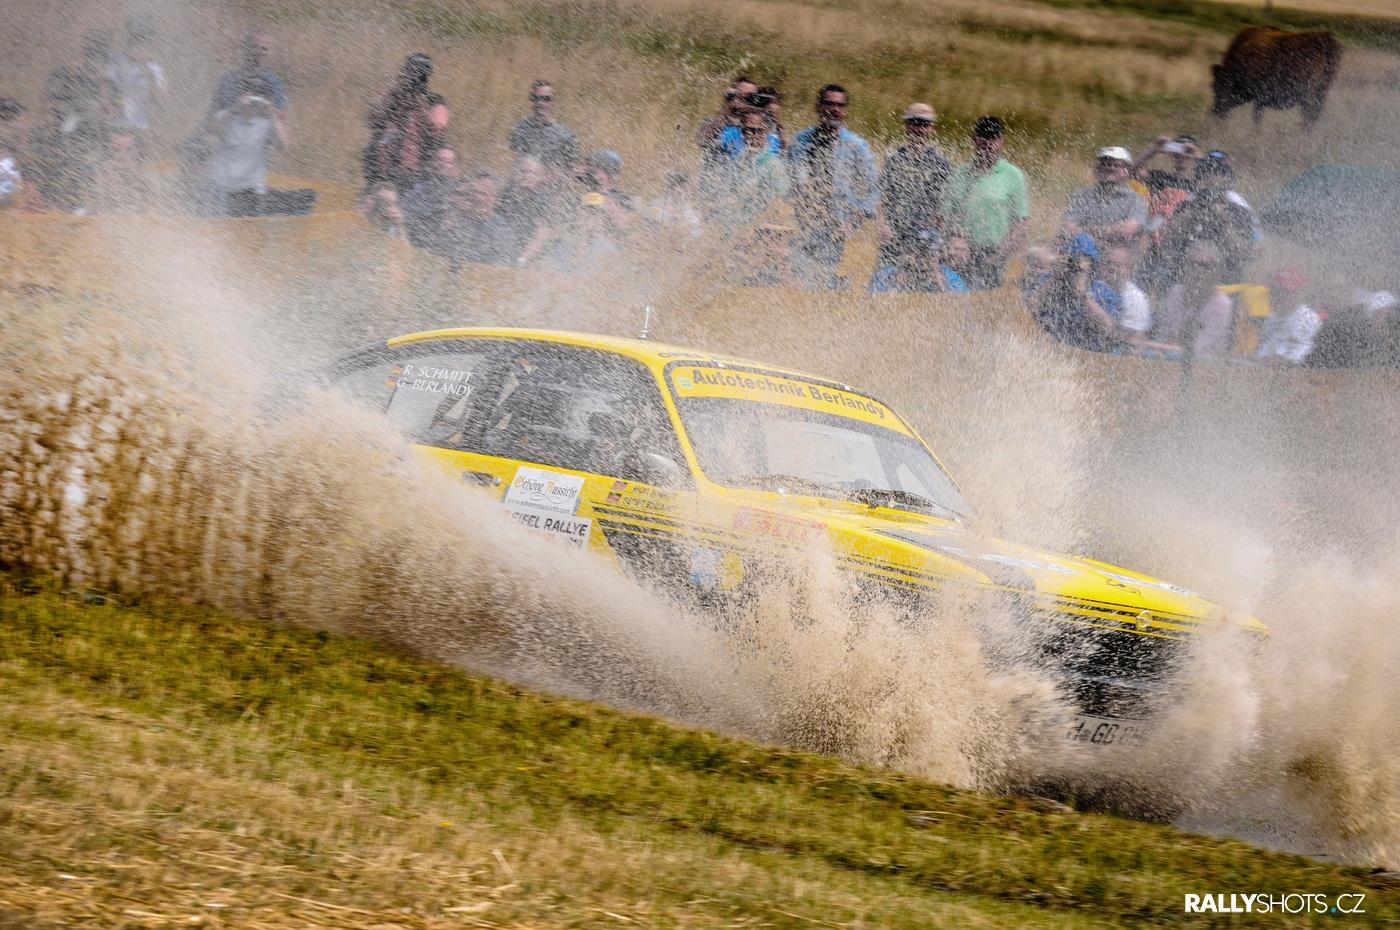 Eifel Rallye Festival 2019 Georg Berlandy